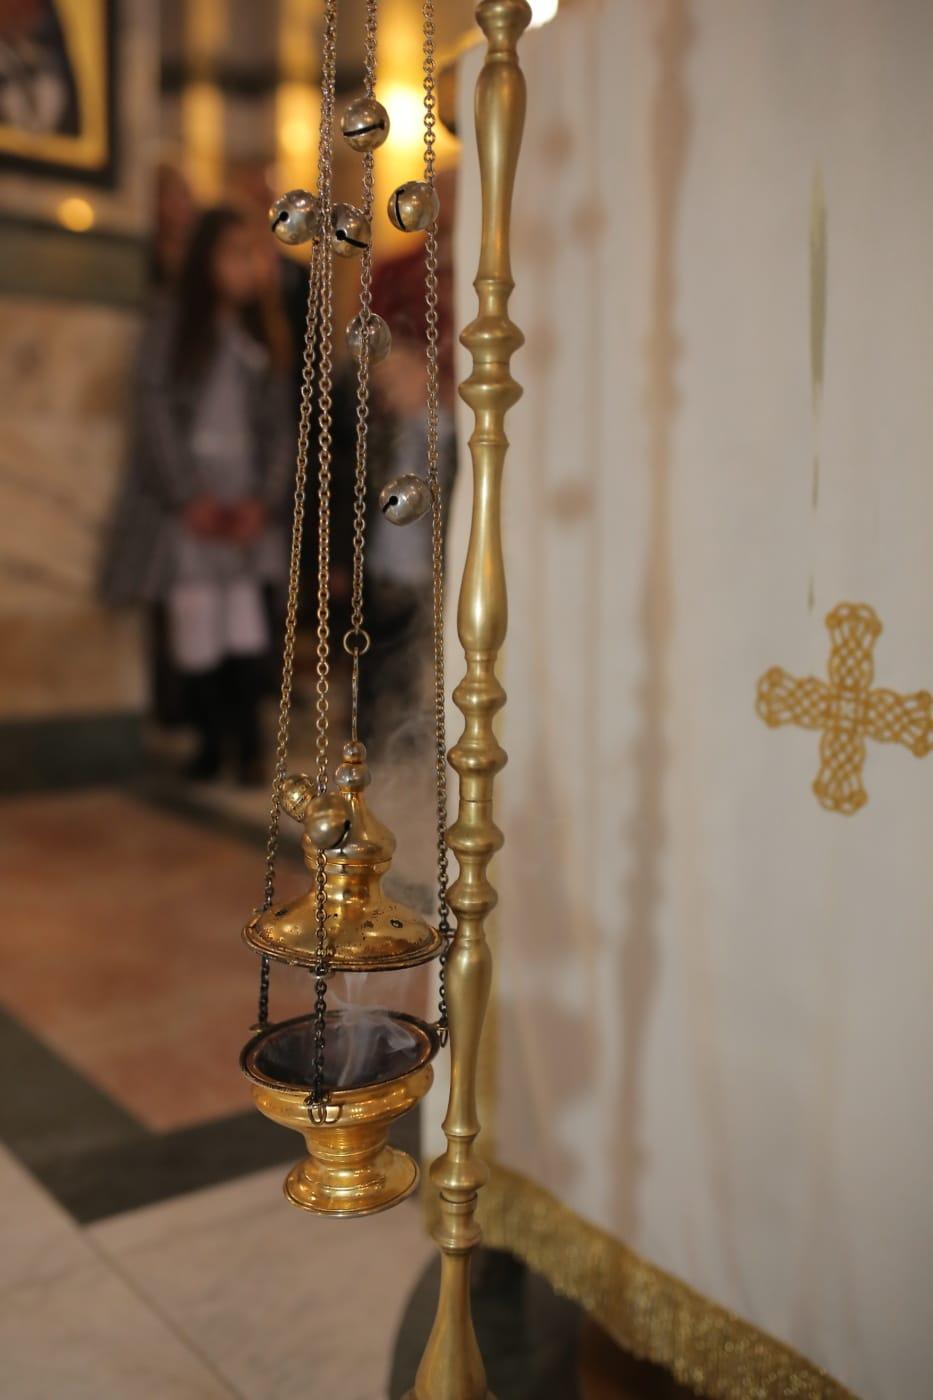 metal, latón, objeto, religiosa, cadena, archivo adjunto, antiguo, antiguo, adentro, tradicional